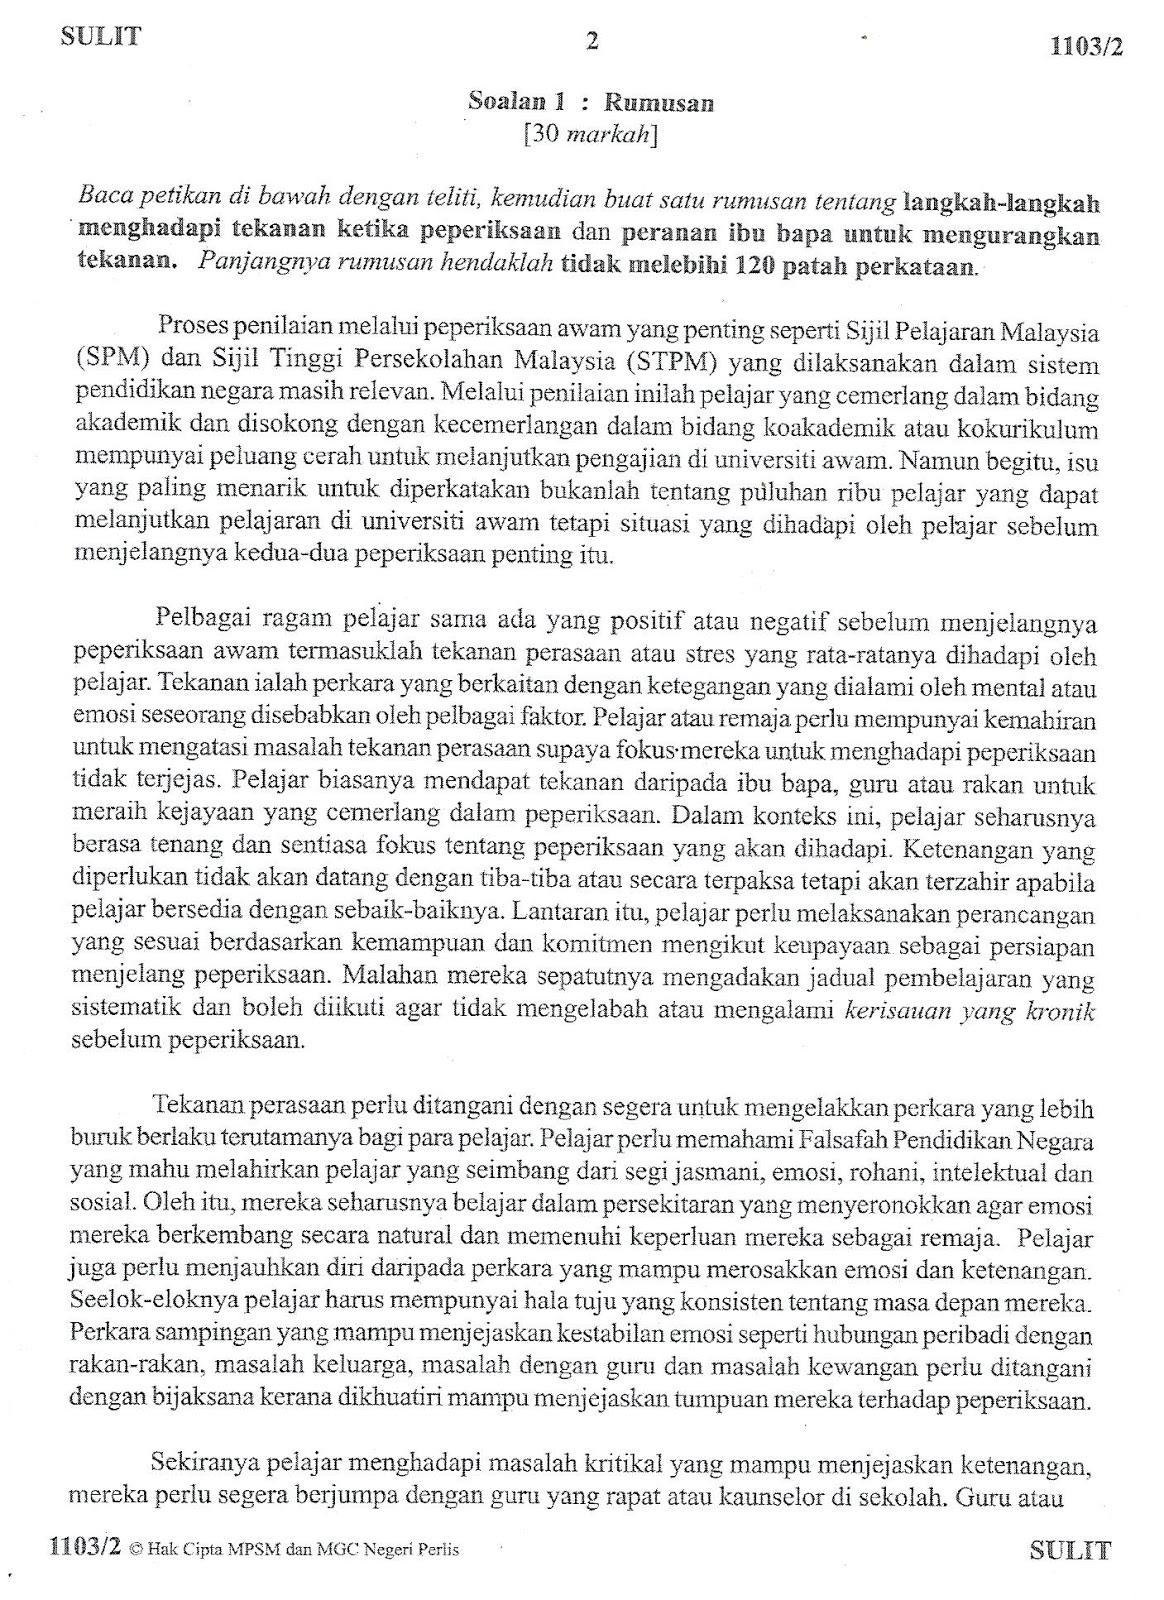 Laman Bahasa Melayu SPM: PANDUAN MENJAWAB TEKS RUMUSAN ...